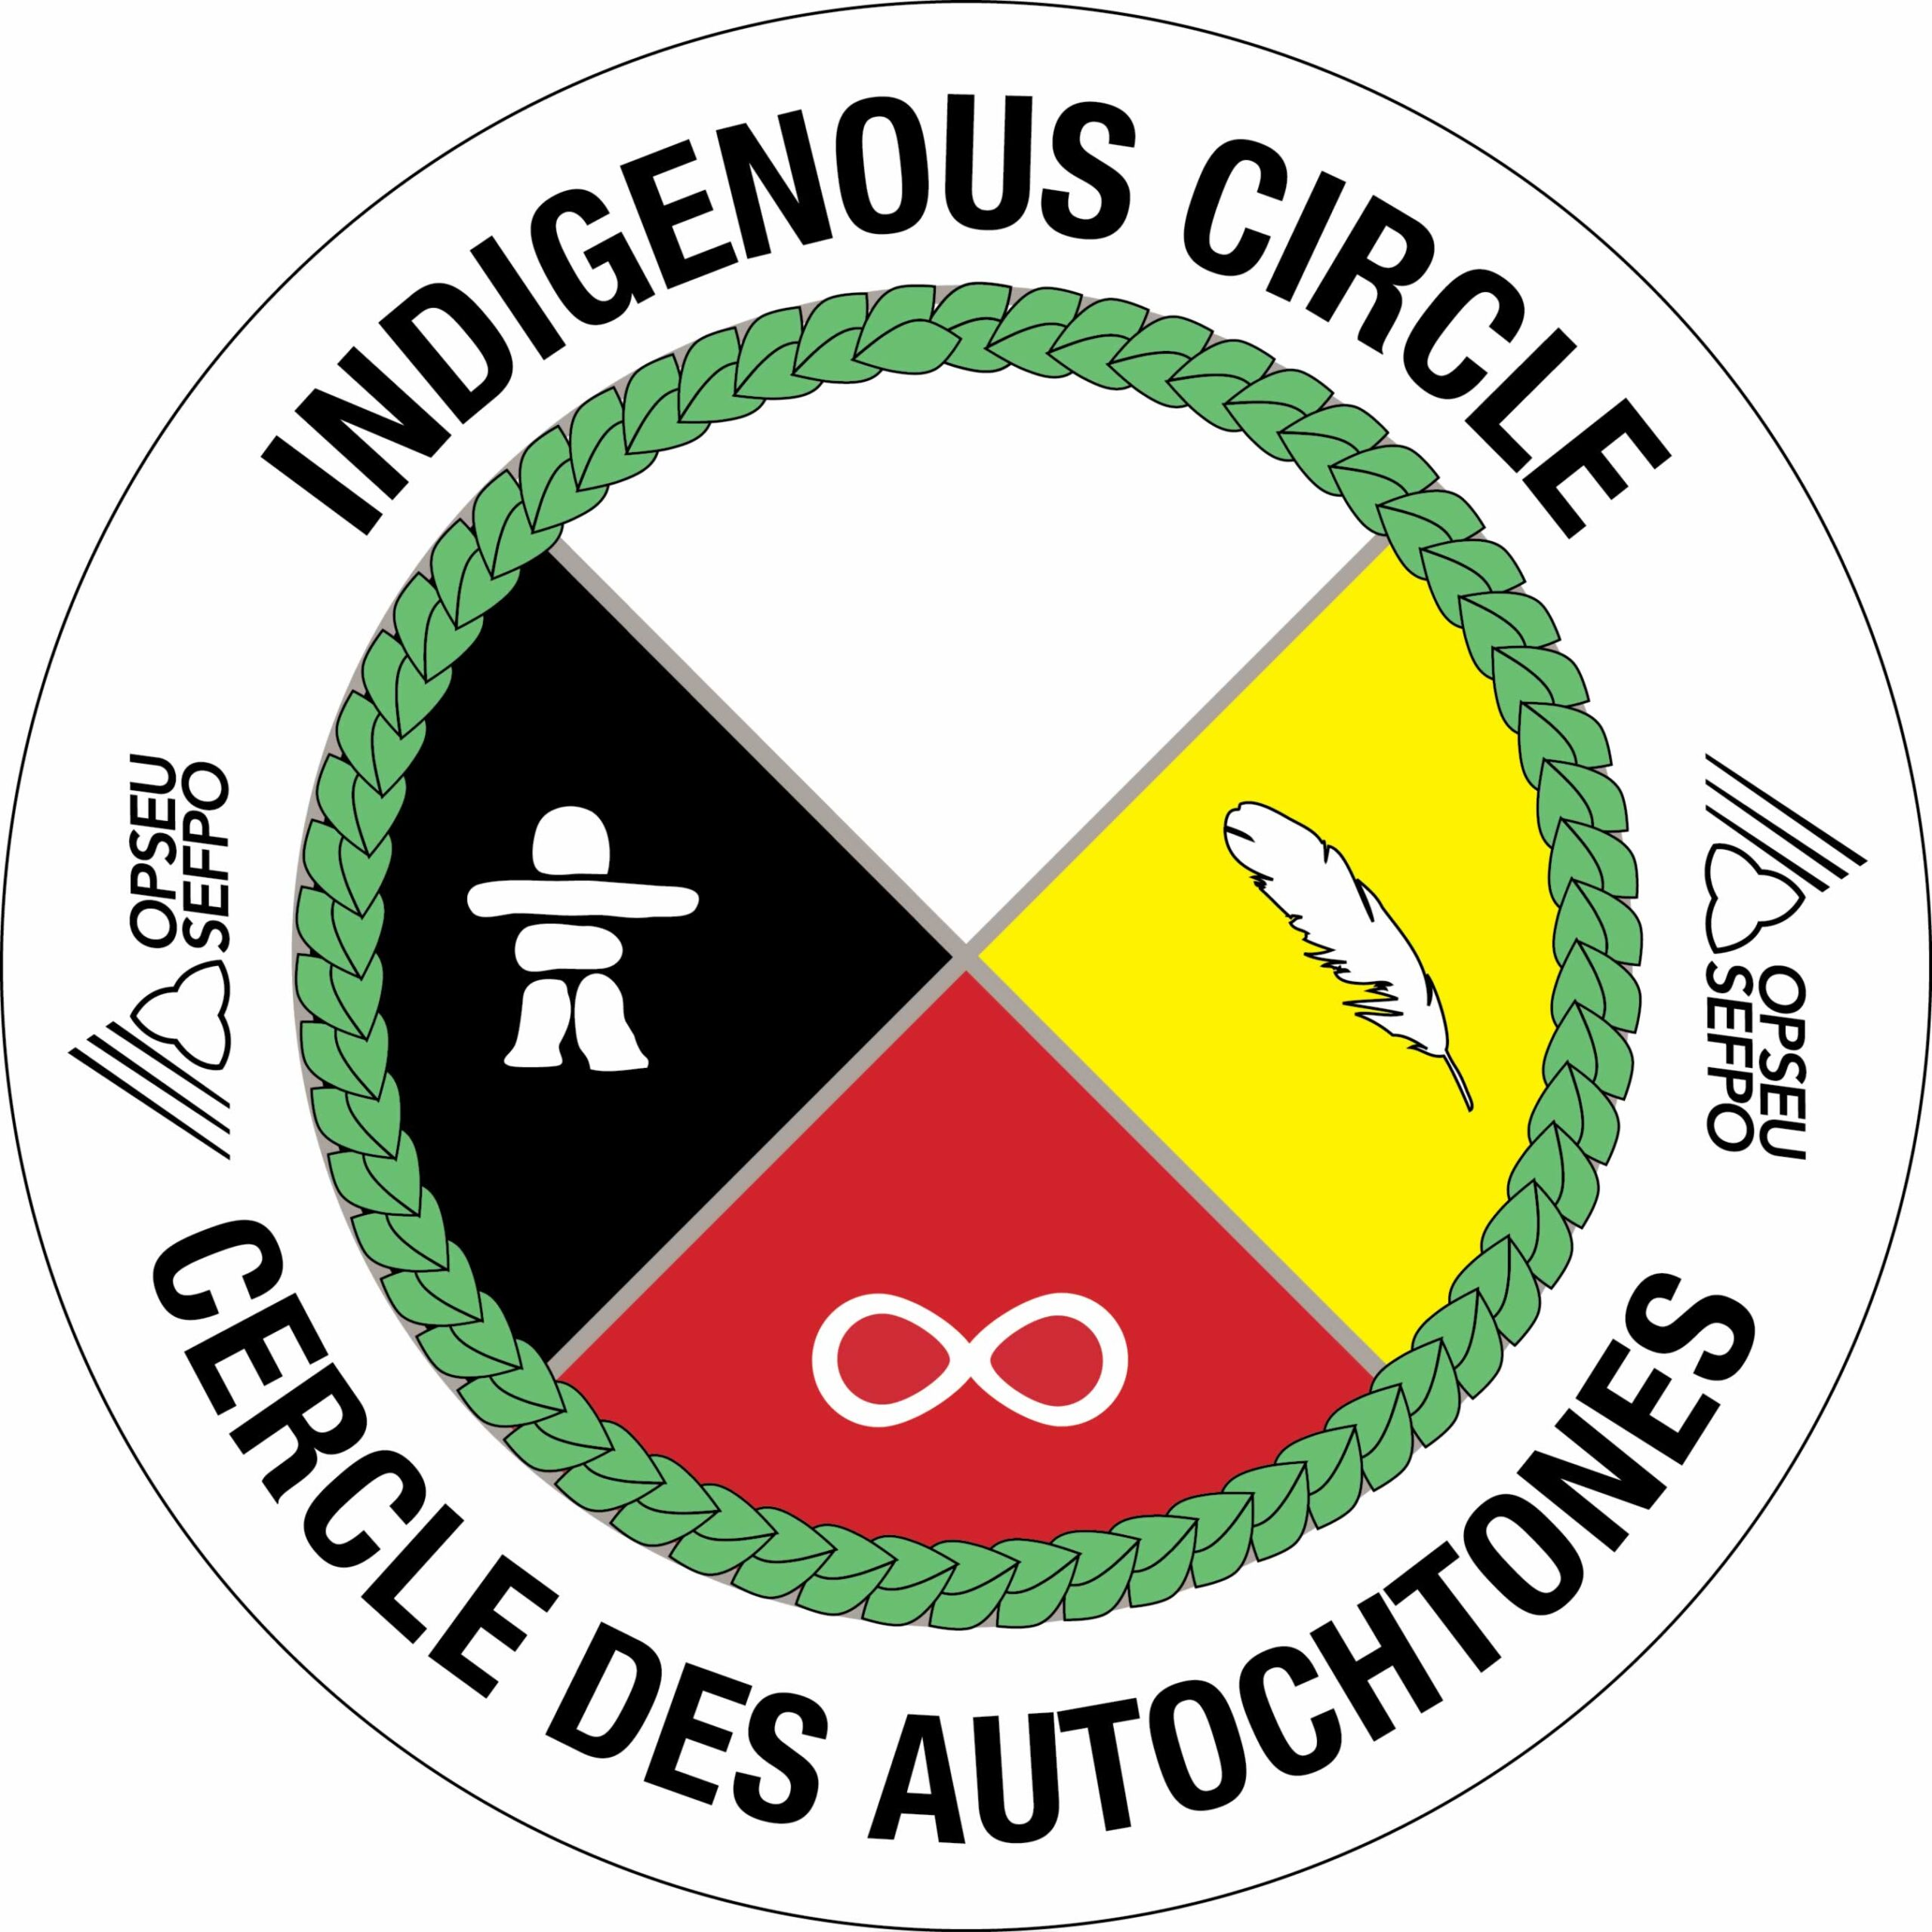 OPSEU SEFPO Indigenous Circle Cercle des autochtones logo